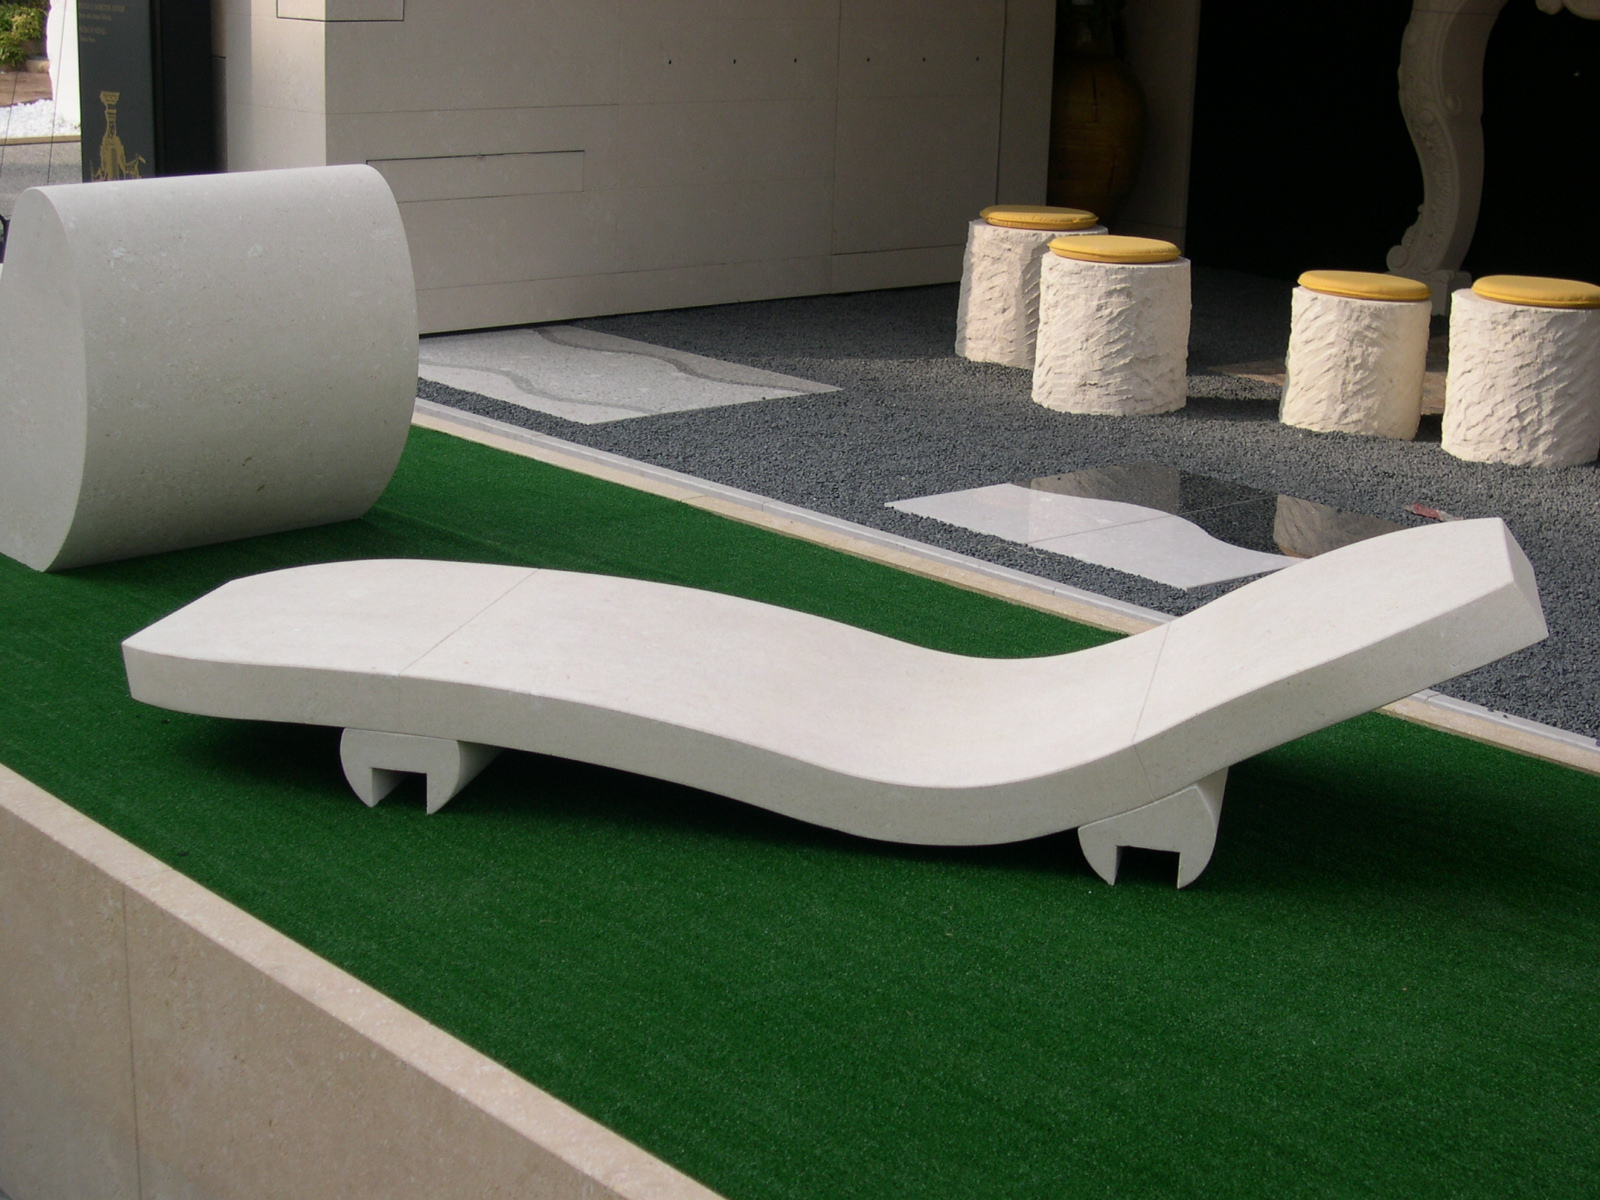 mobilier de jardin en pierre naturelle a lambesc tailleur de pierres marseiile d coration. Black Bedroom Furniture Sets. Home Design Ideas